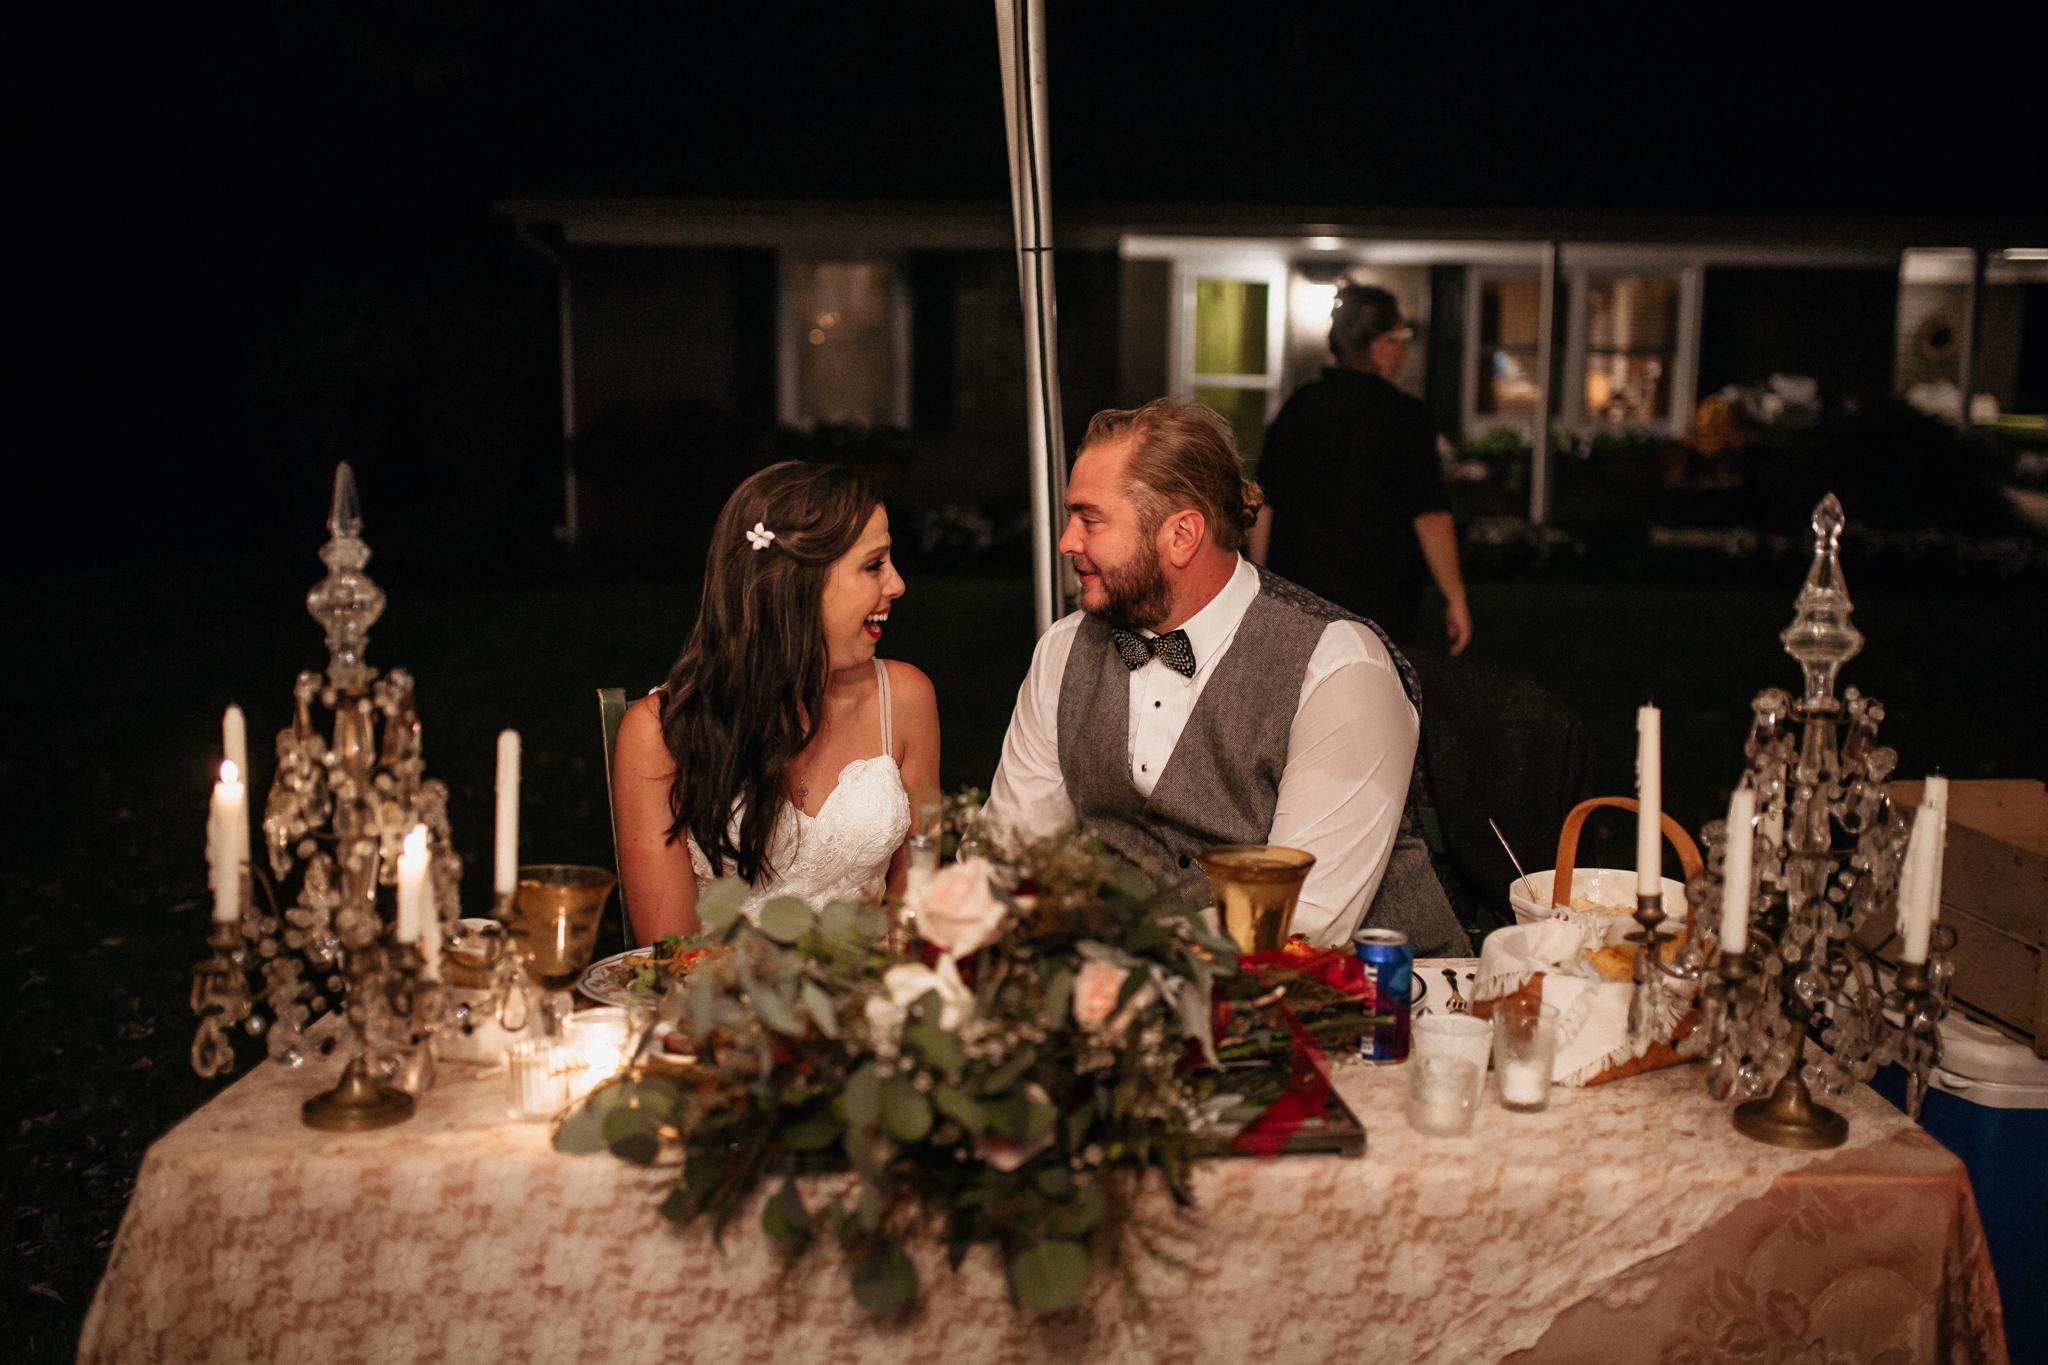 rainy-intimate-backyard-wedding-the-hatches-kentucky-memphis-gatlinburg-nashville-tennessee-wedding-photographer-the-hatches-utah-colorado-washington-arizona-oregon-yosemite-national-park-elopement-adventure-emotional-journalistic-bohemian-florals-minimalistic-winery-elegant-timeless-engagement